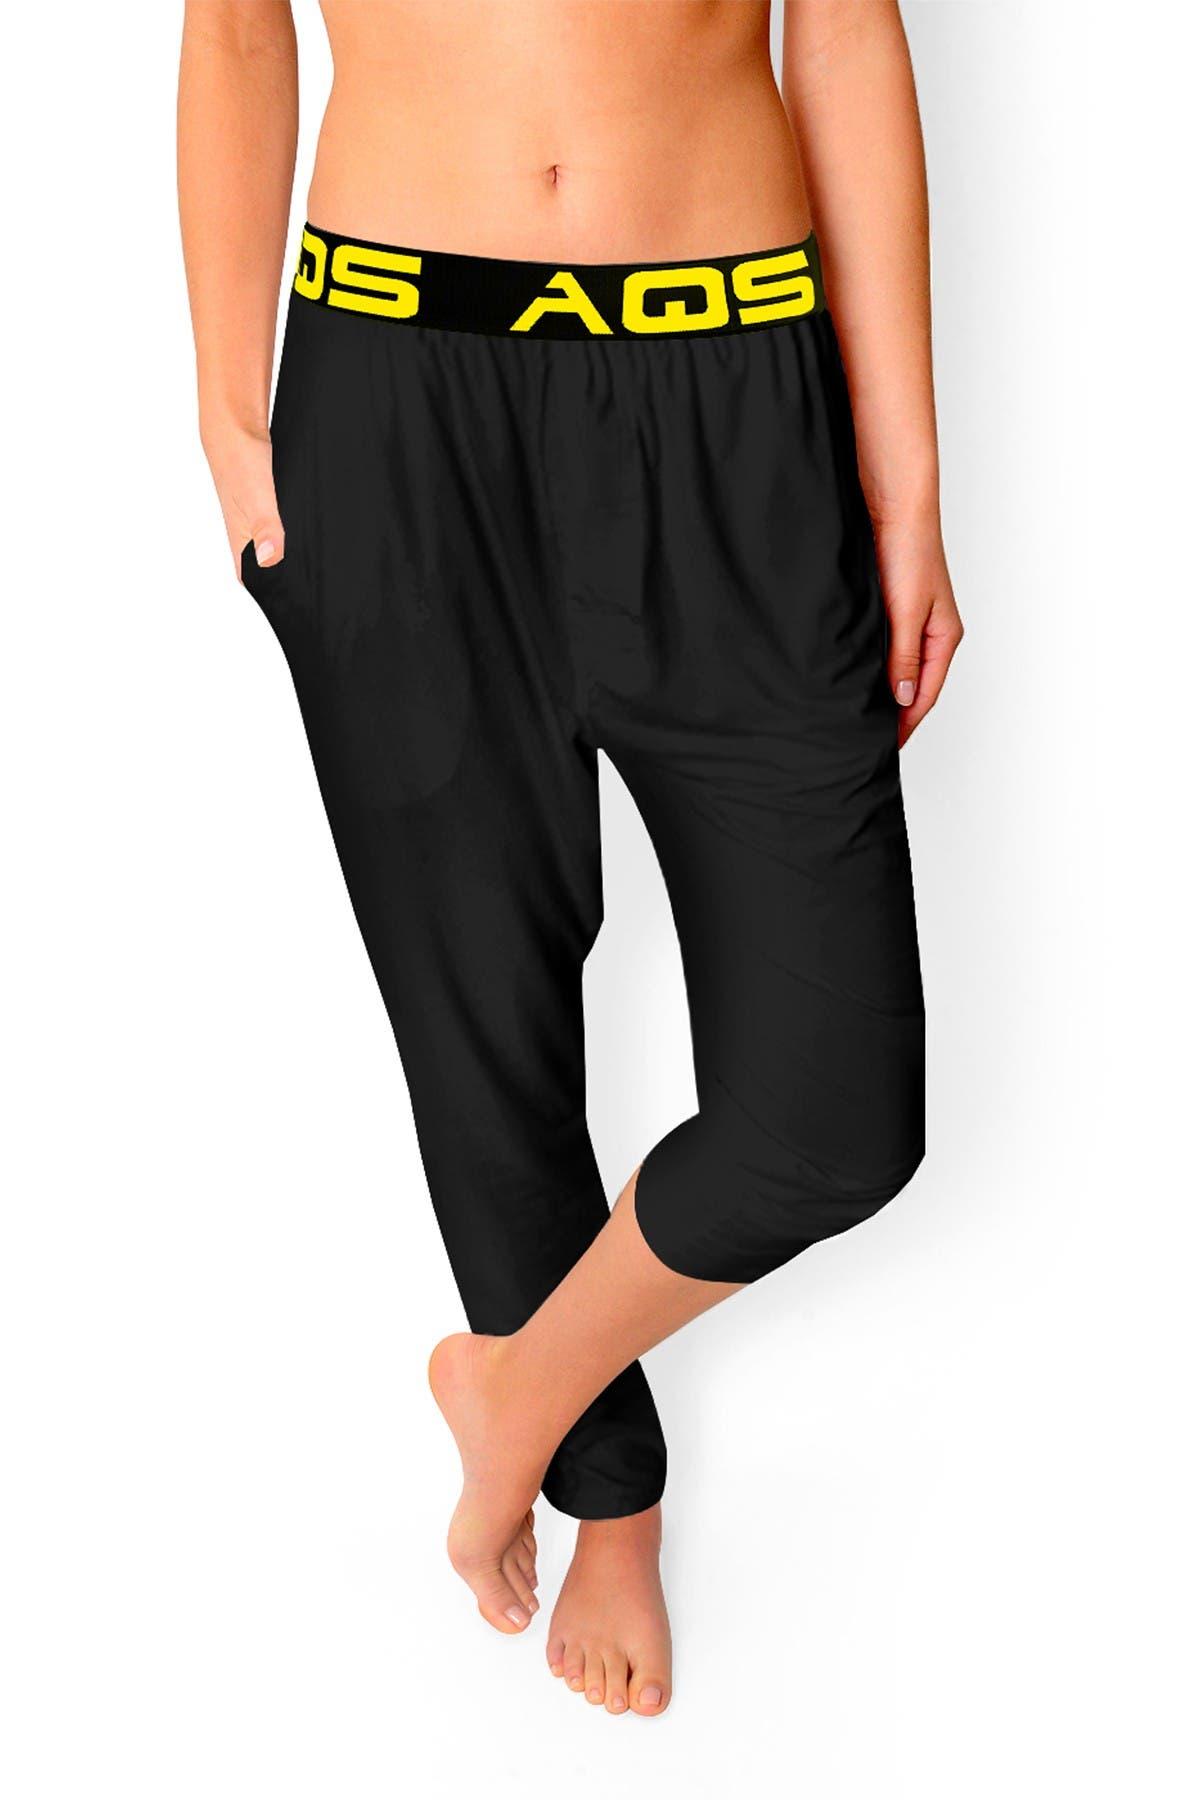 Image of AQS Soft Knit Lounge Pants